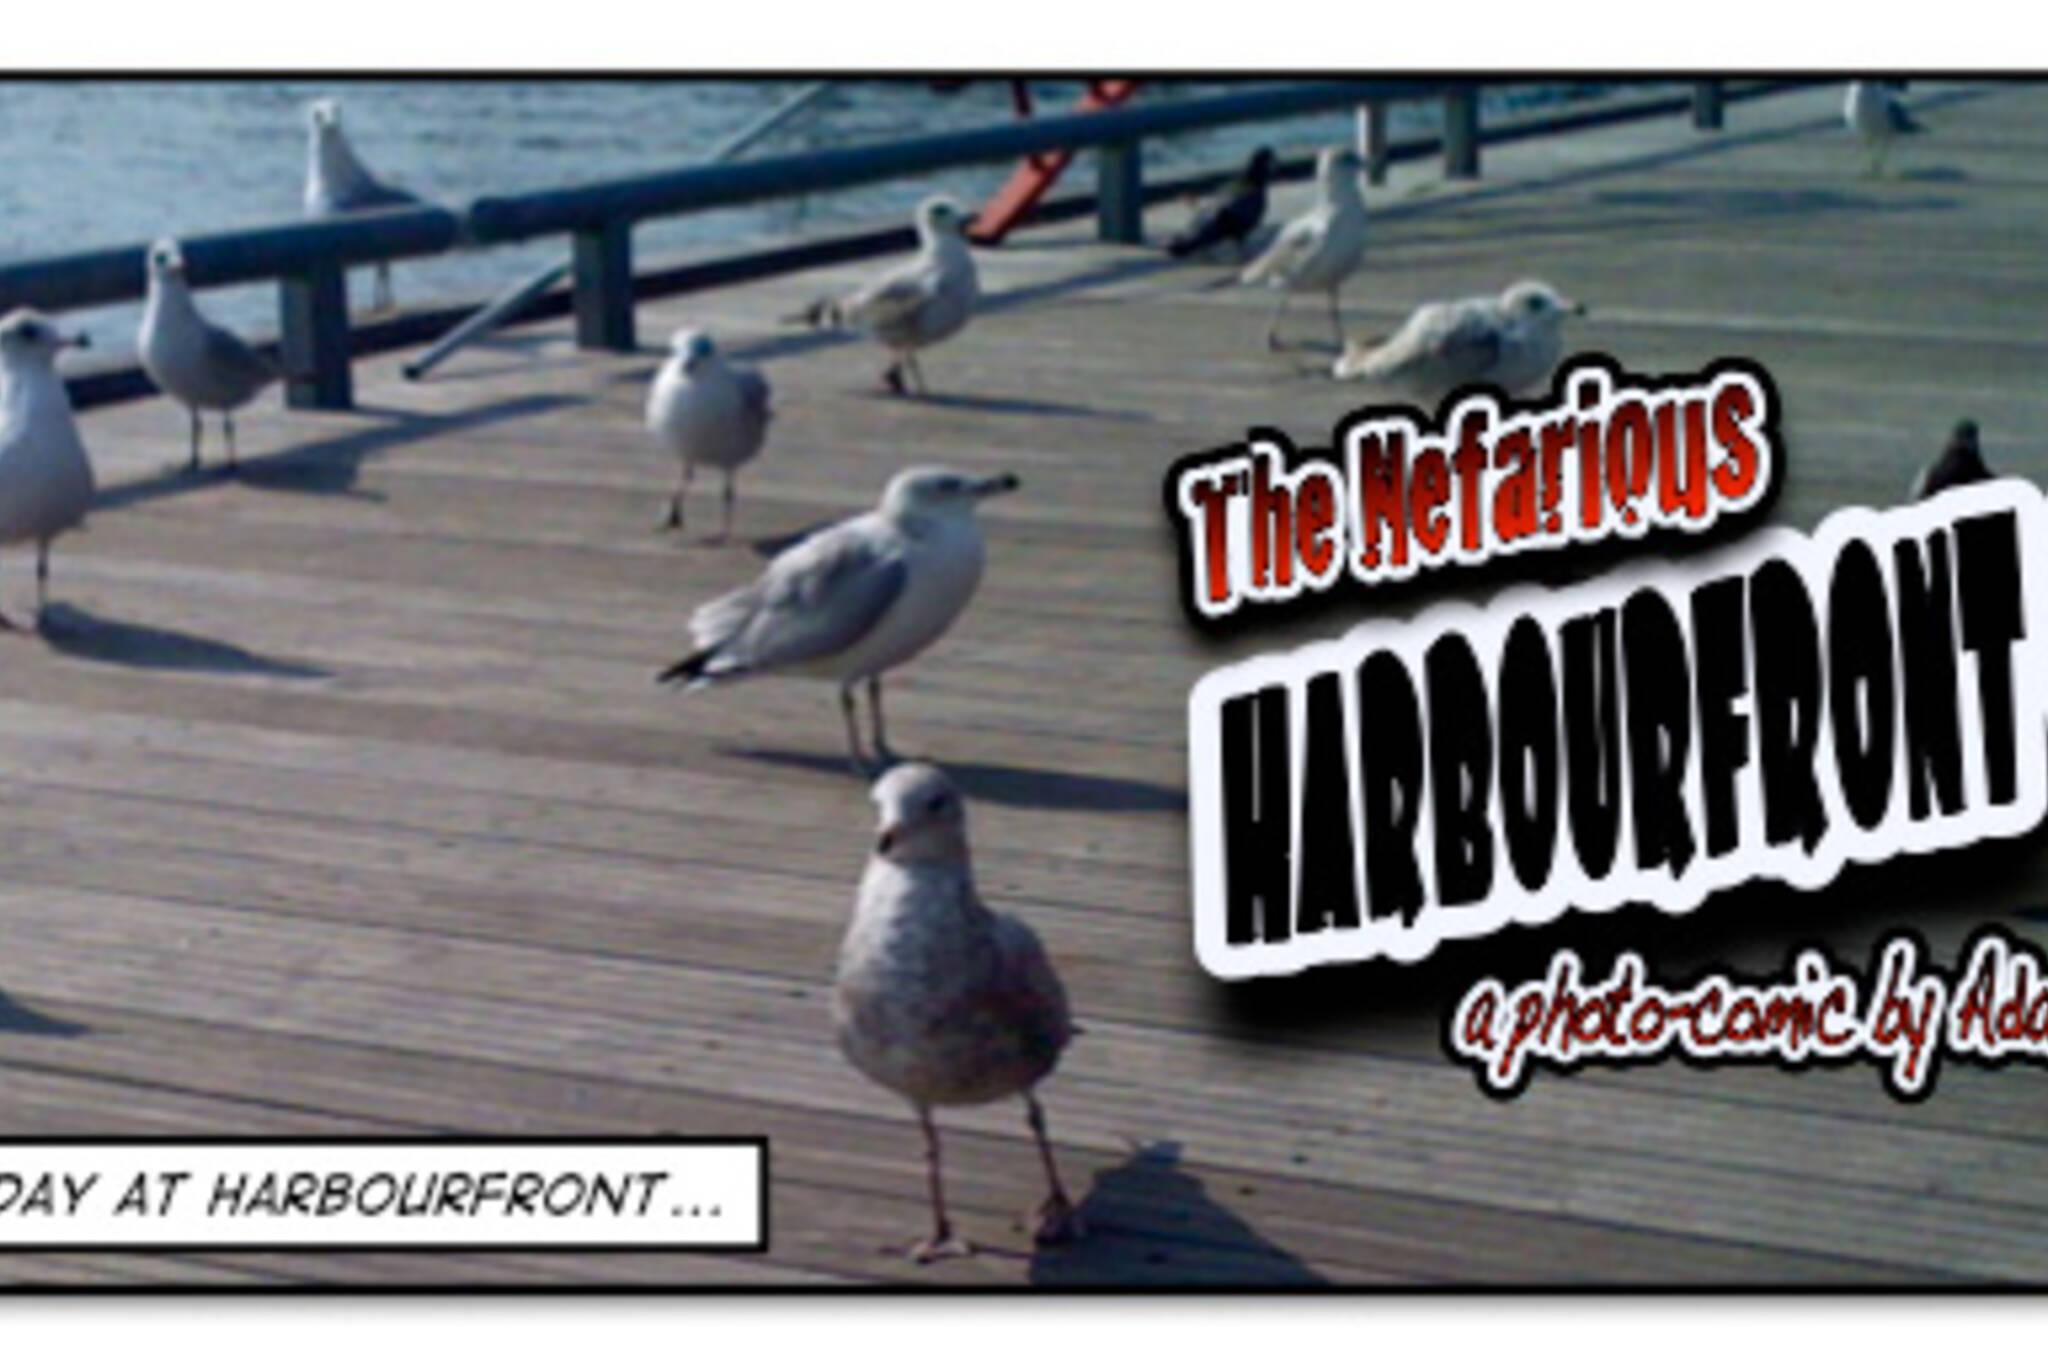 Nefarious Harbourfront Gulls